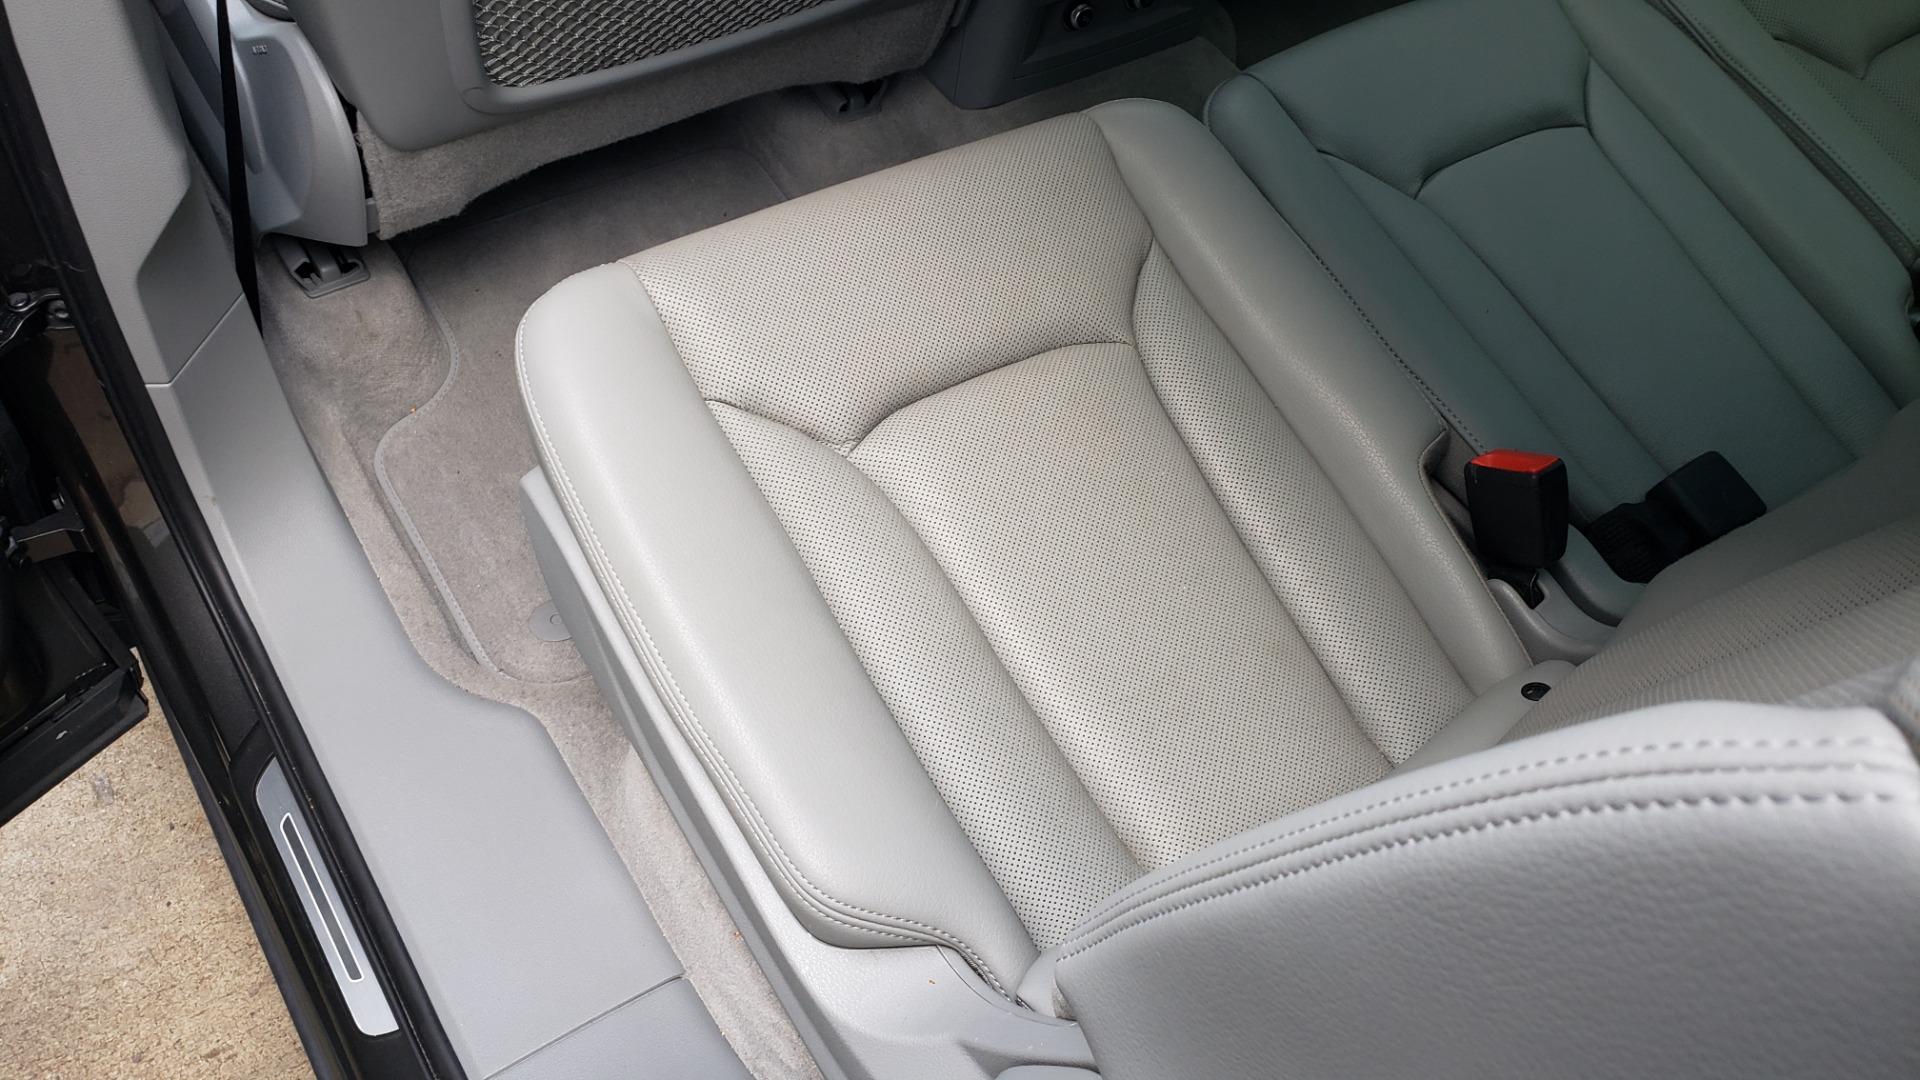 Used 2018 Audi Q7 PRESTIGE TIPTRONIC / NAV / SUNROOF / ADAPTIVE PKG / DRVR ASST / CLD WTHR /  for sale $49,995 at Formula Imports in Charlotte NC 28227 60